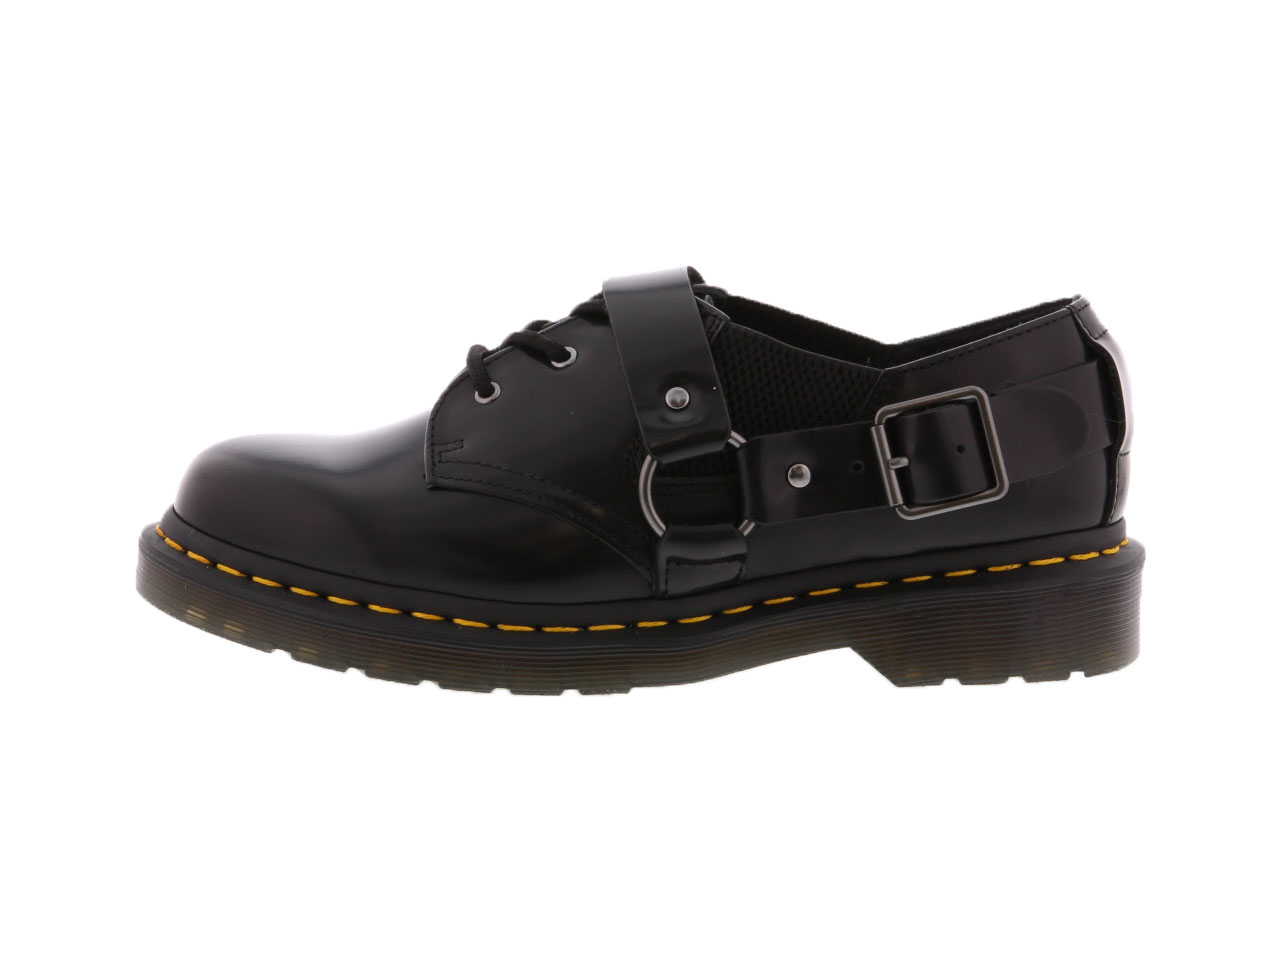 Dr.Martens FULMAR(23867001)【ドクターマーチン】【シューズ】【ブーツ】【靴】【フットウェア】